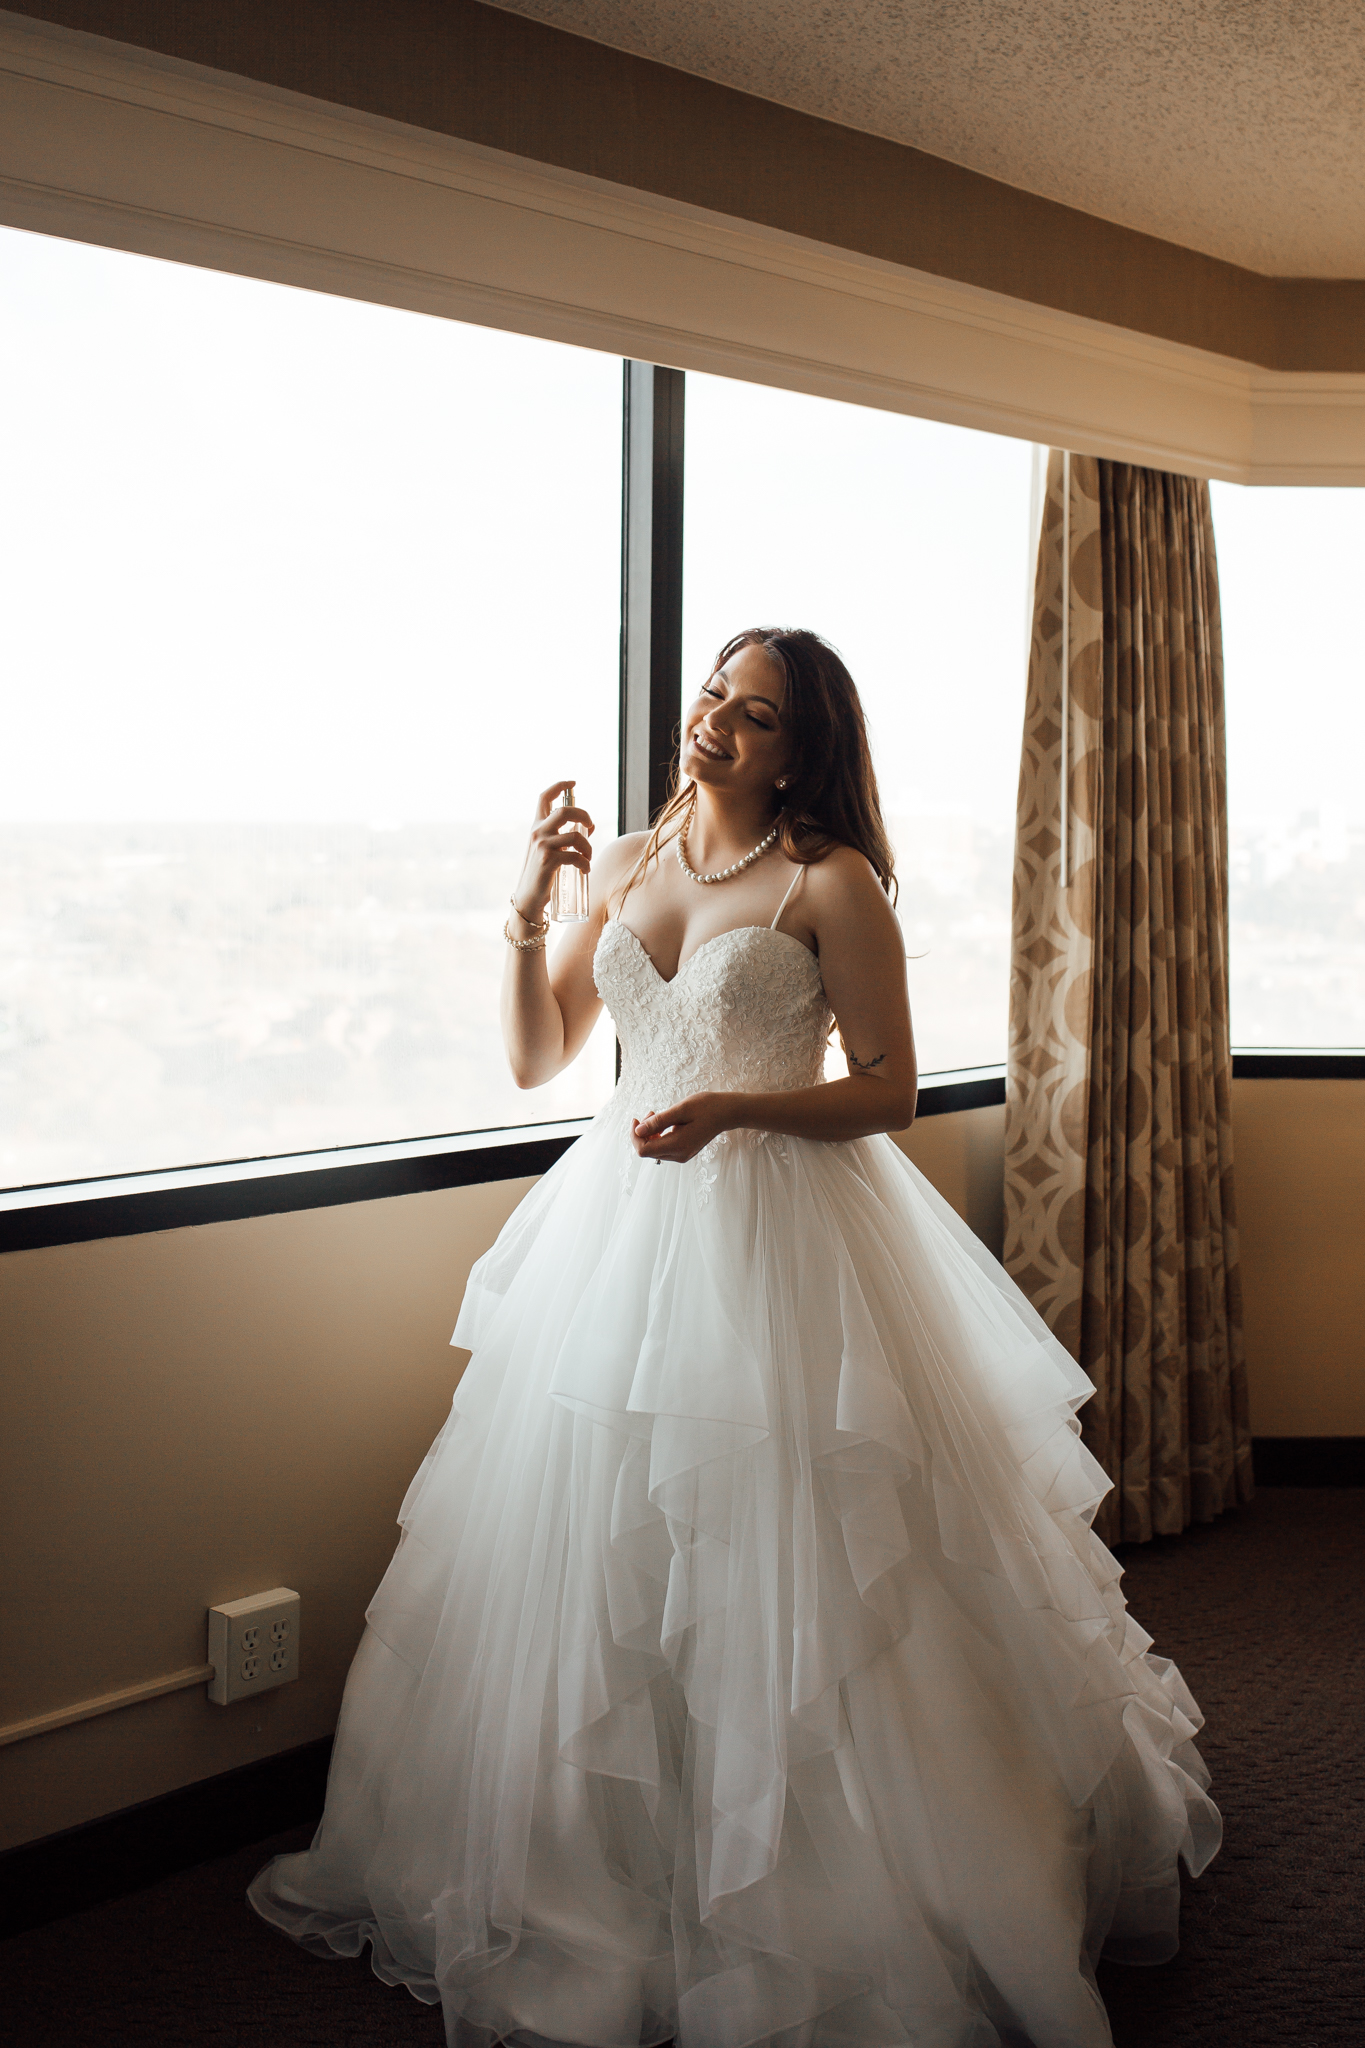 memphis-wedding-photographers-thewarmtharoundyou-ballinese-ballroom (14 of 65).jpg